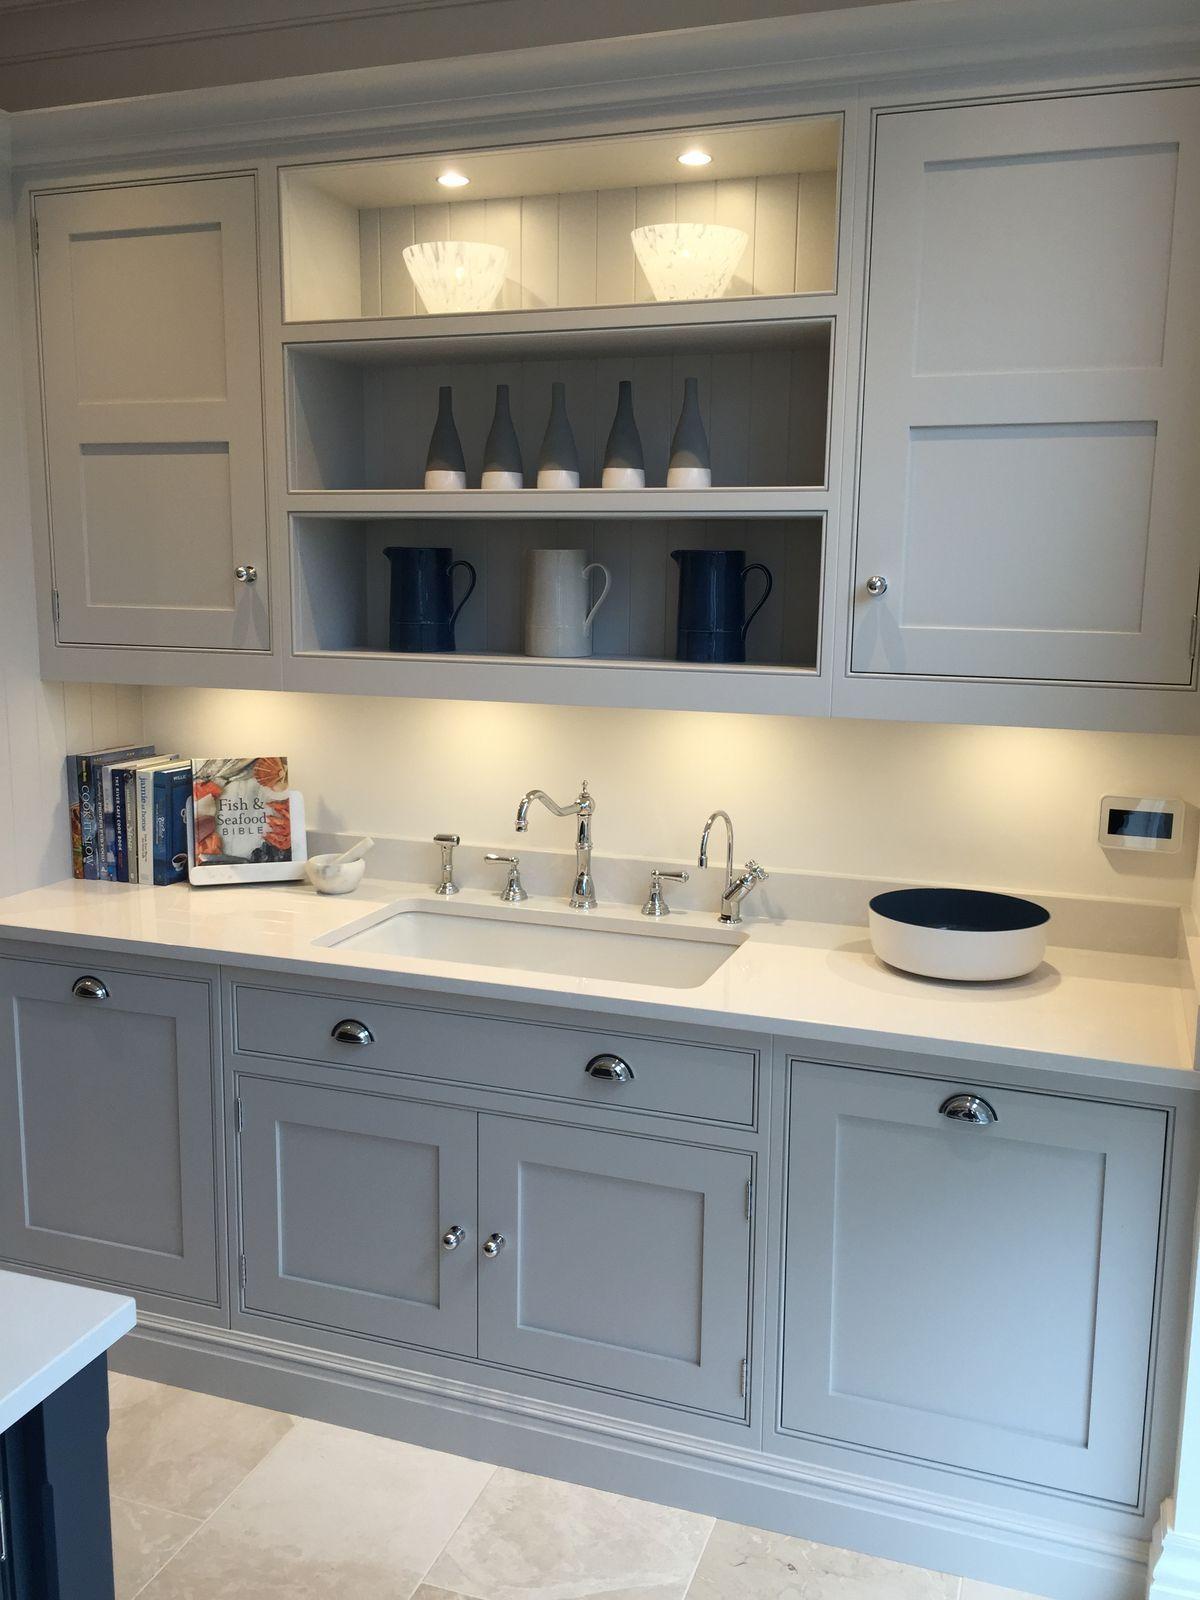 Berühmt Sarah Newton Kücheentwerfer Bilder - Küchenschrank Ideen ...